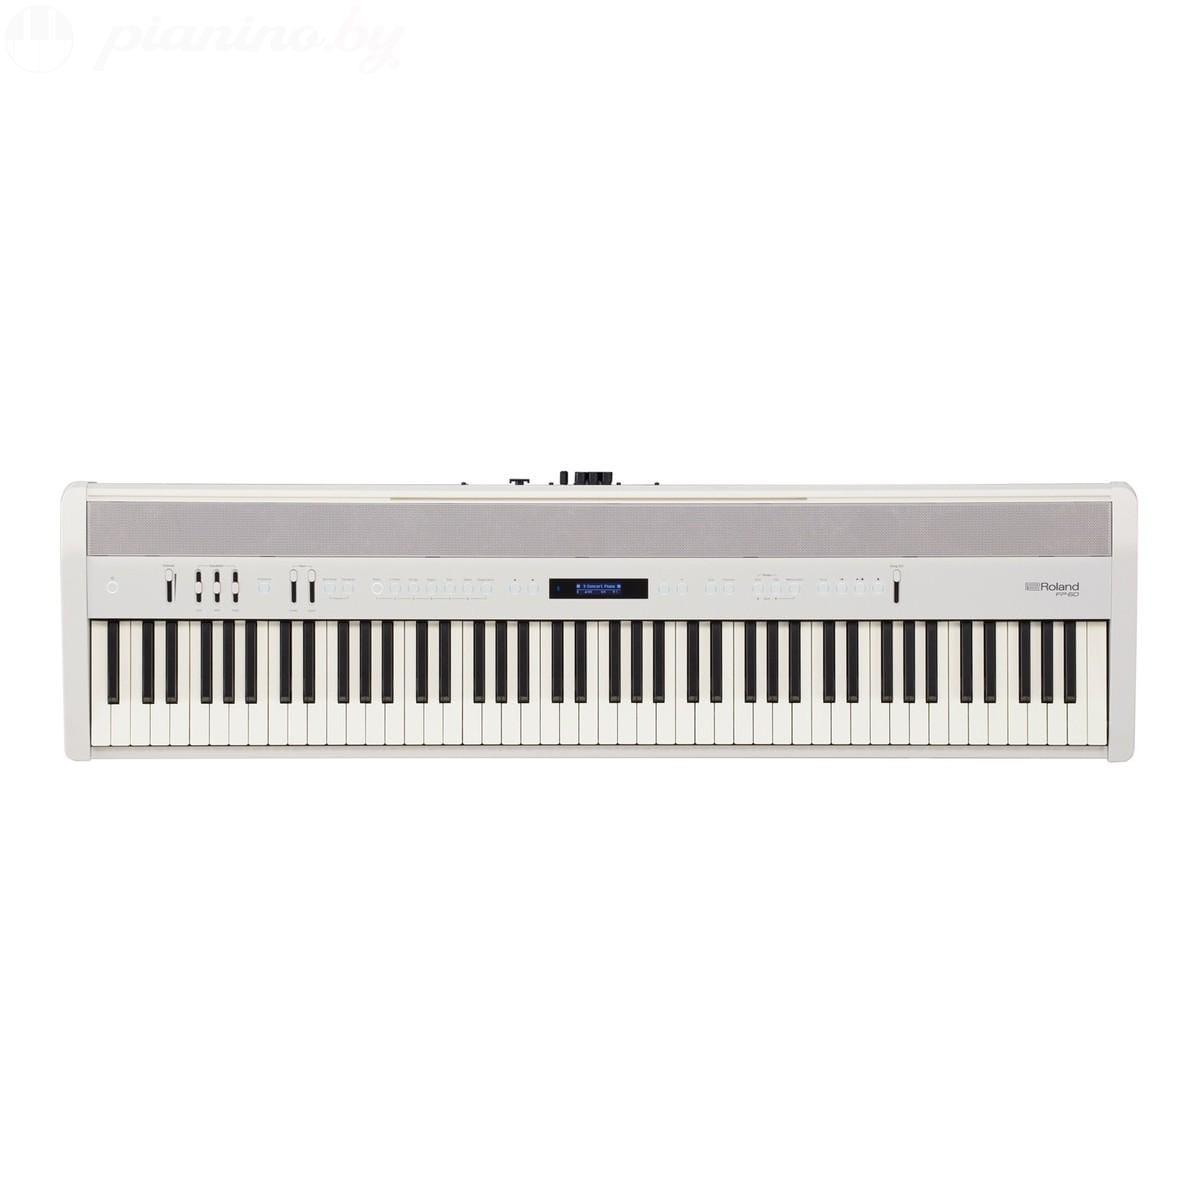 Цифровое пианино Roland FP-60 White Фото 1